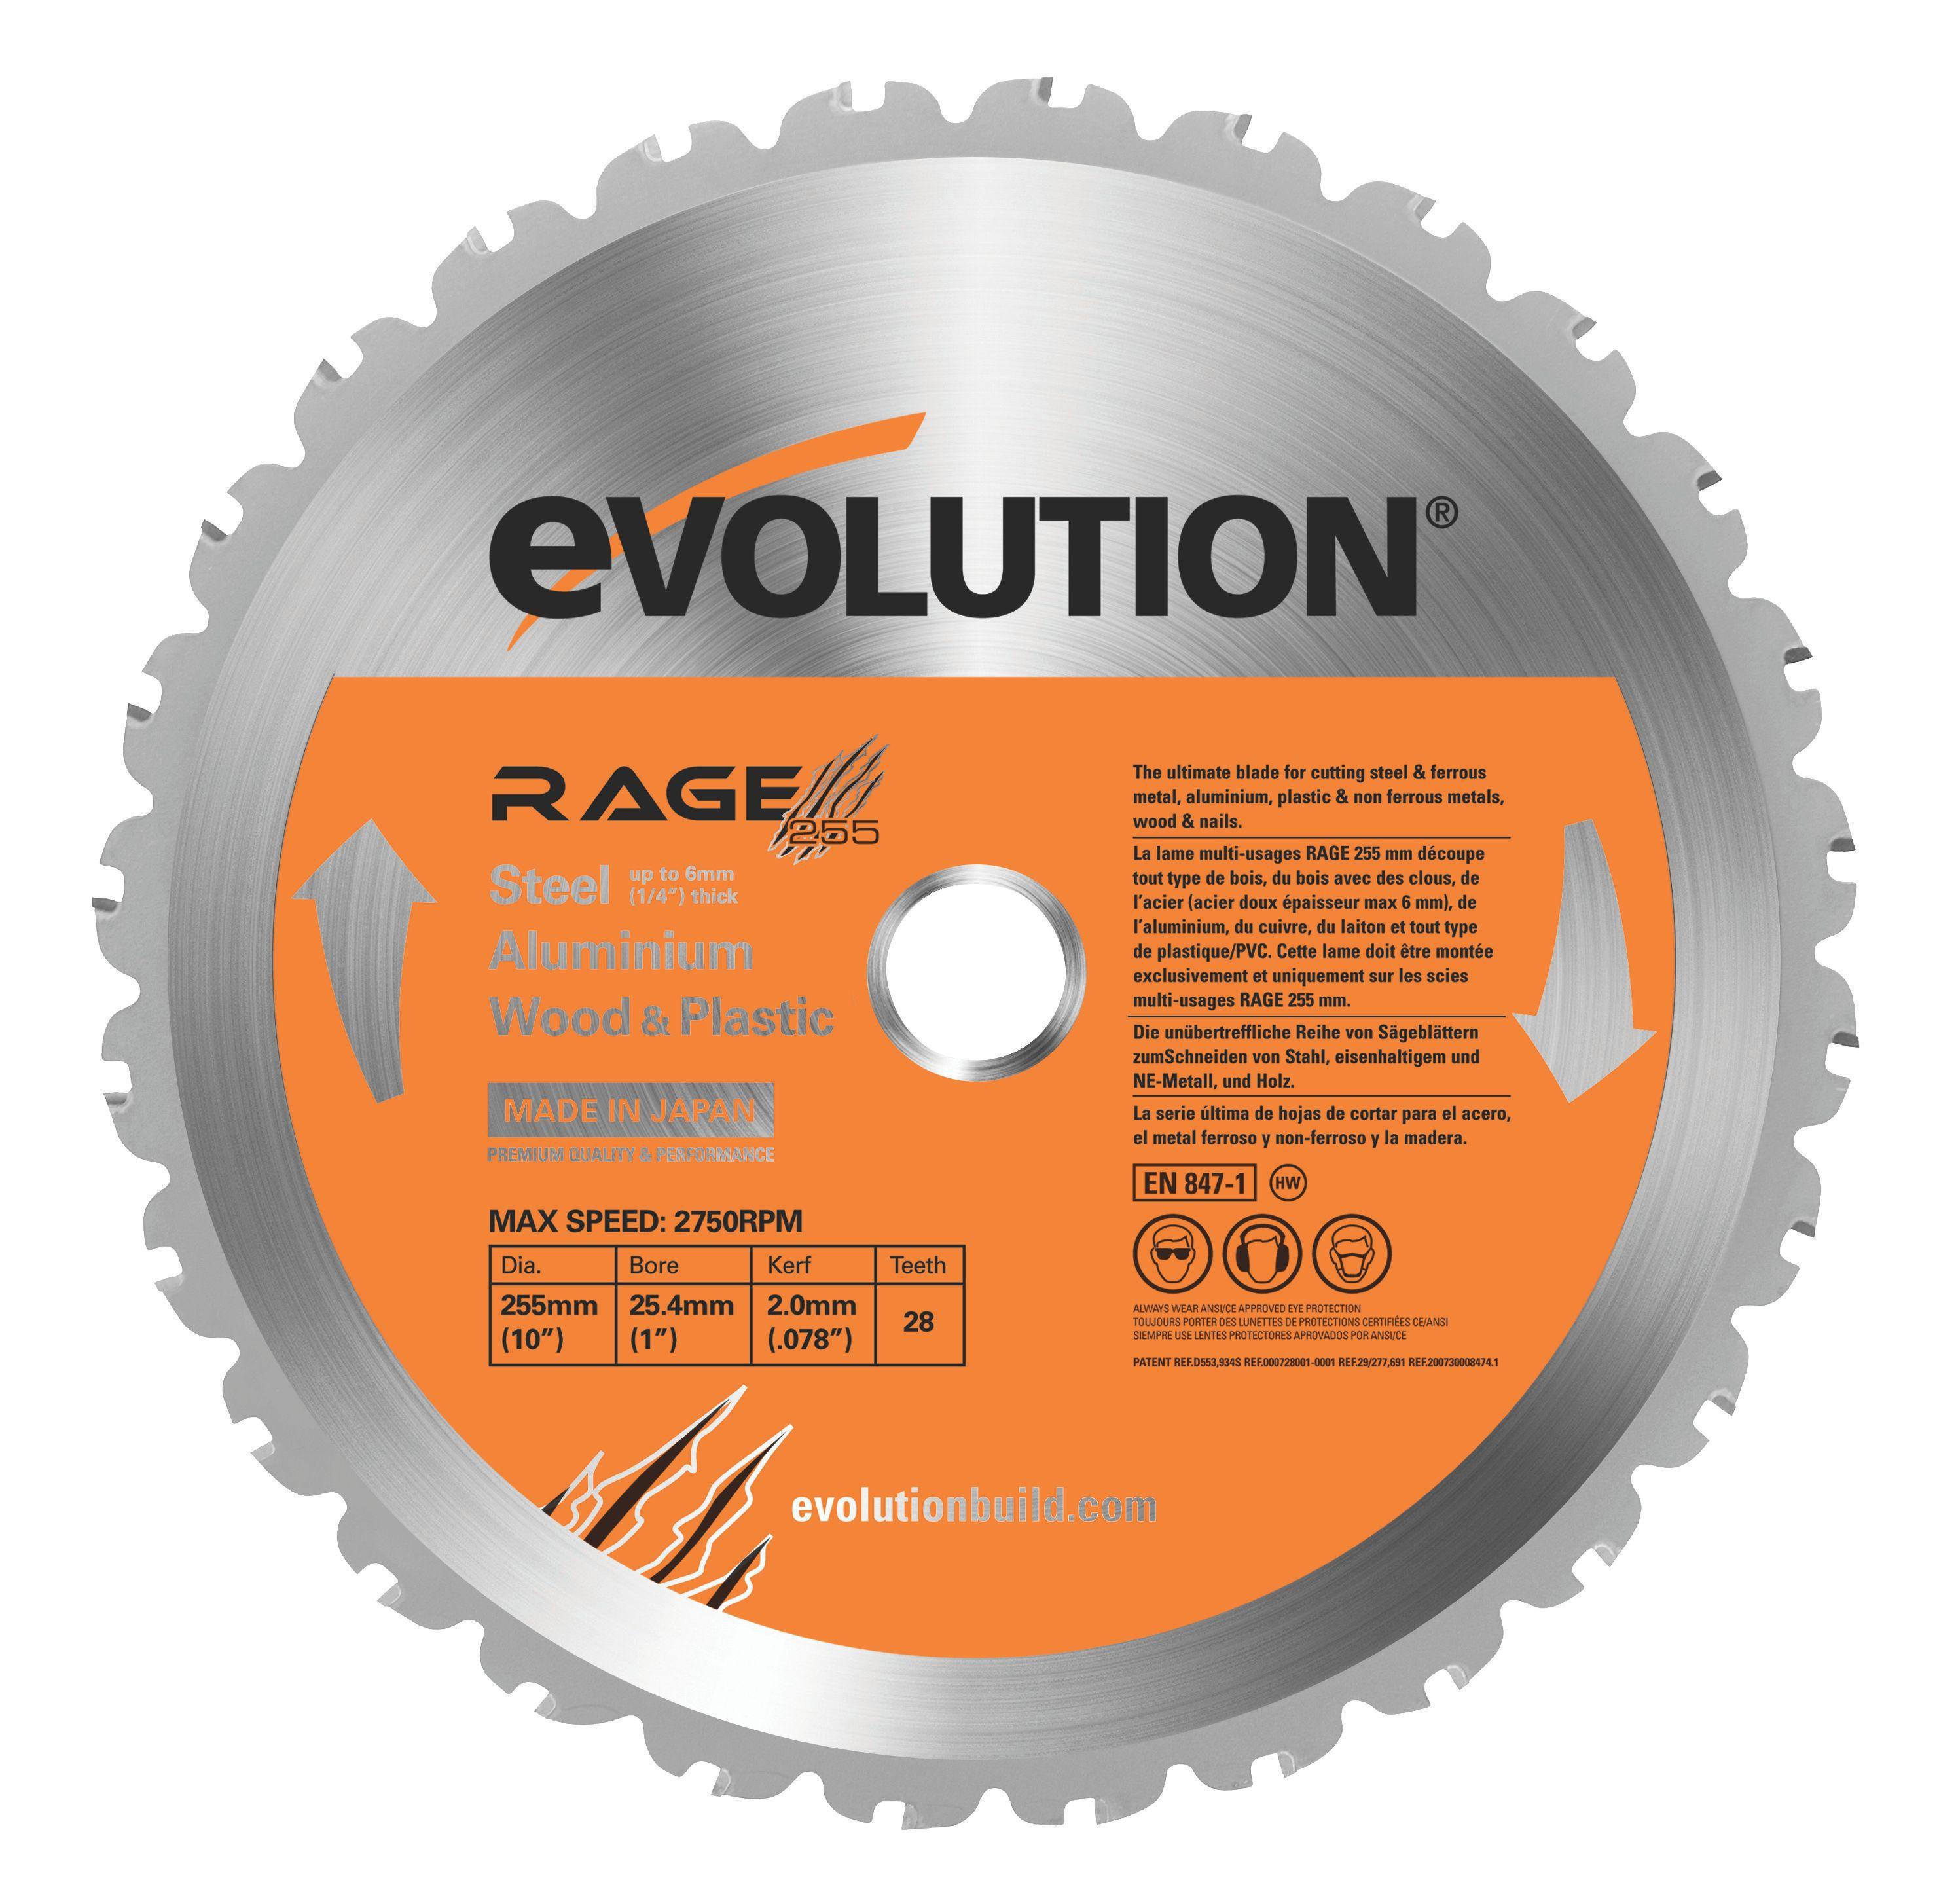 Evolution Rage 28t Circular Saw Blade (dia)255mm